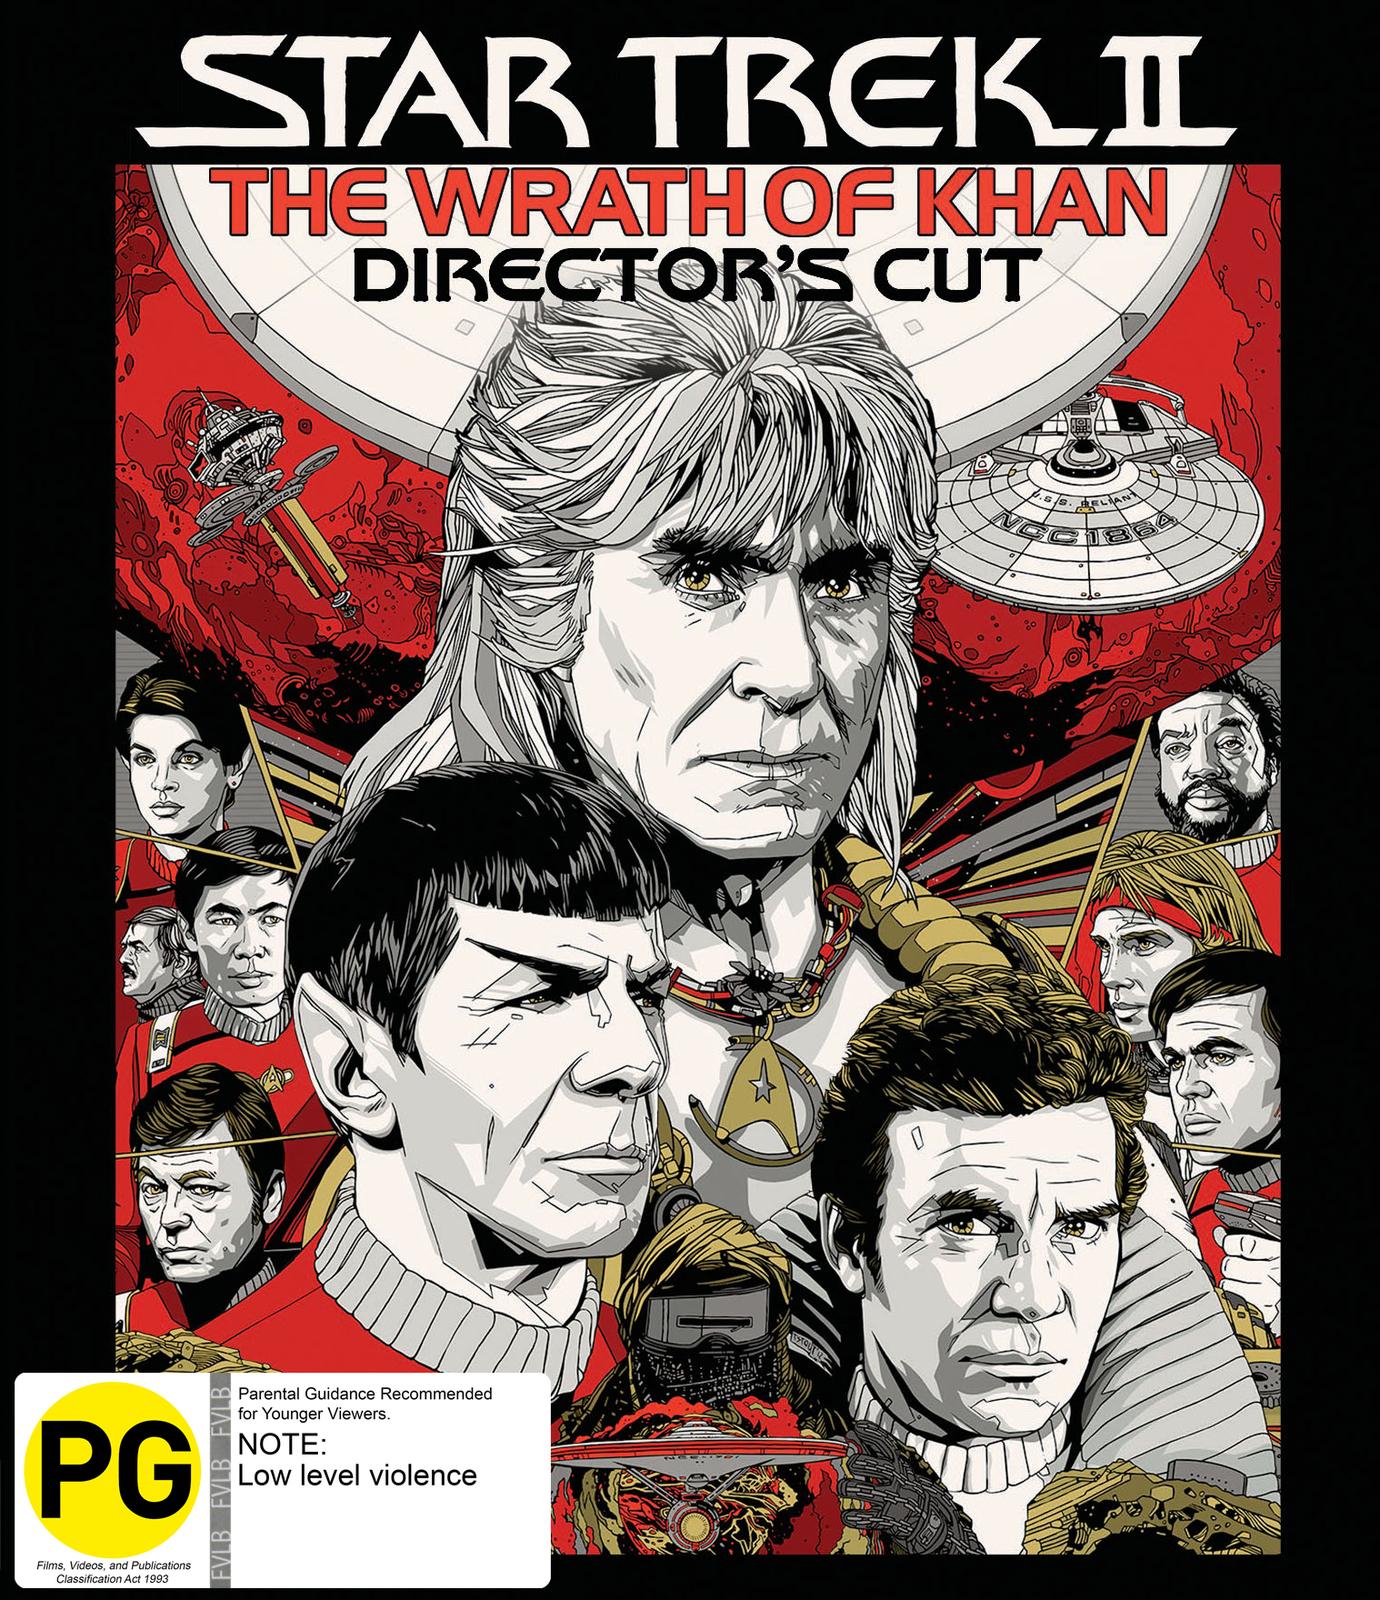 Star Trek 2 - The Wrath Of Khan (Director's Cut Edition) on Blu-ray image